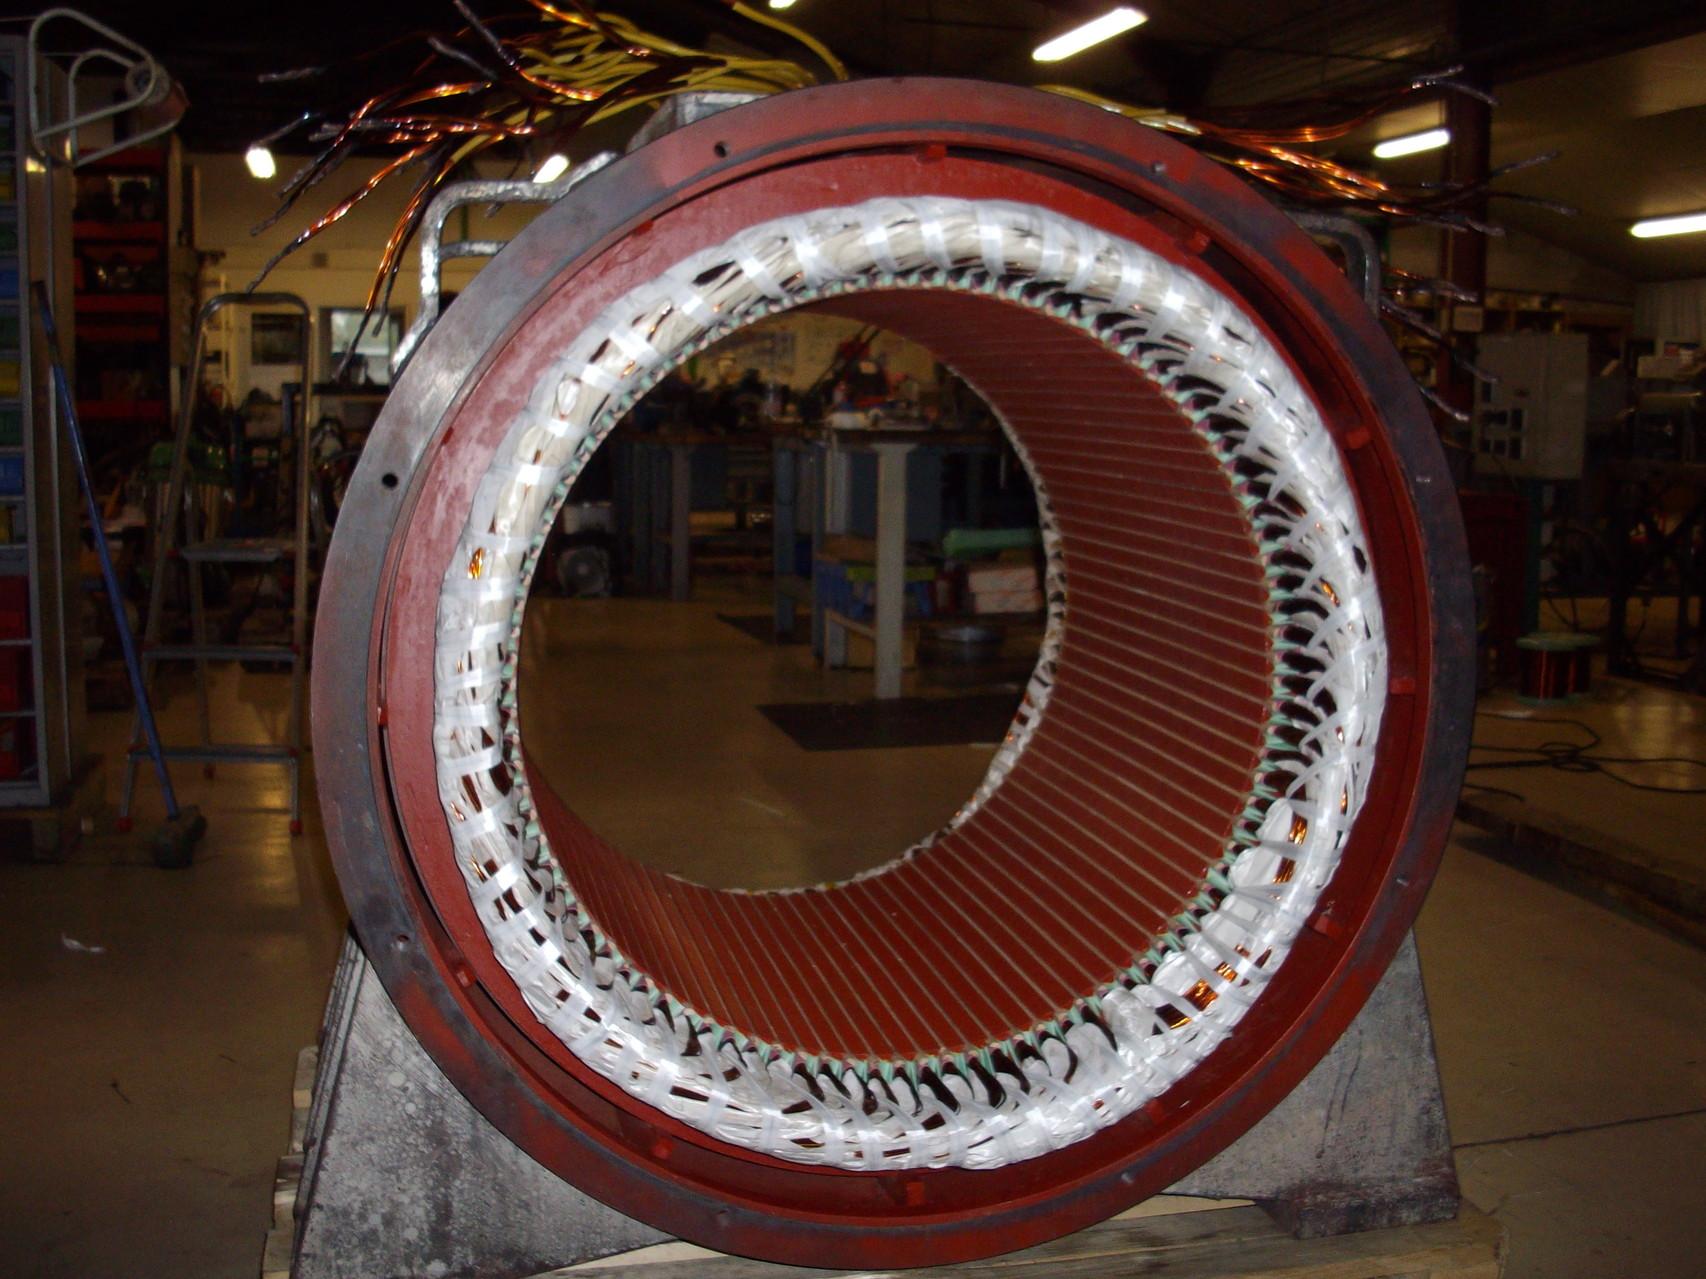 Bobinage génératrice 480 kW